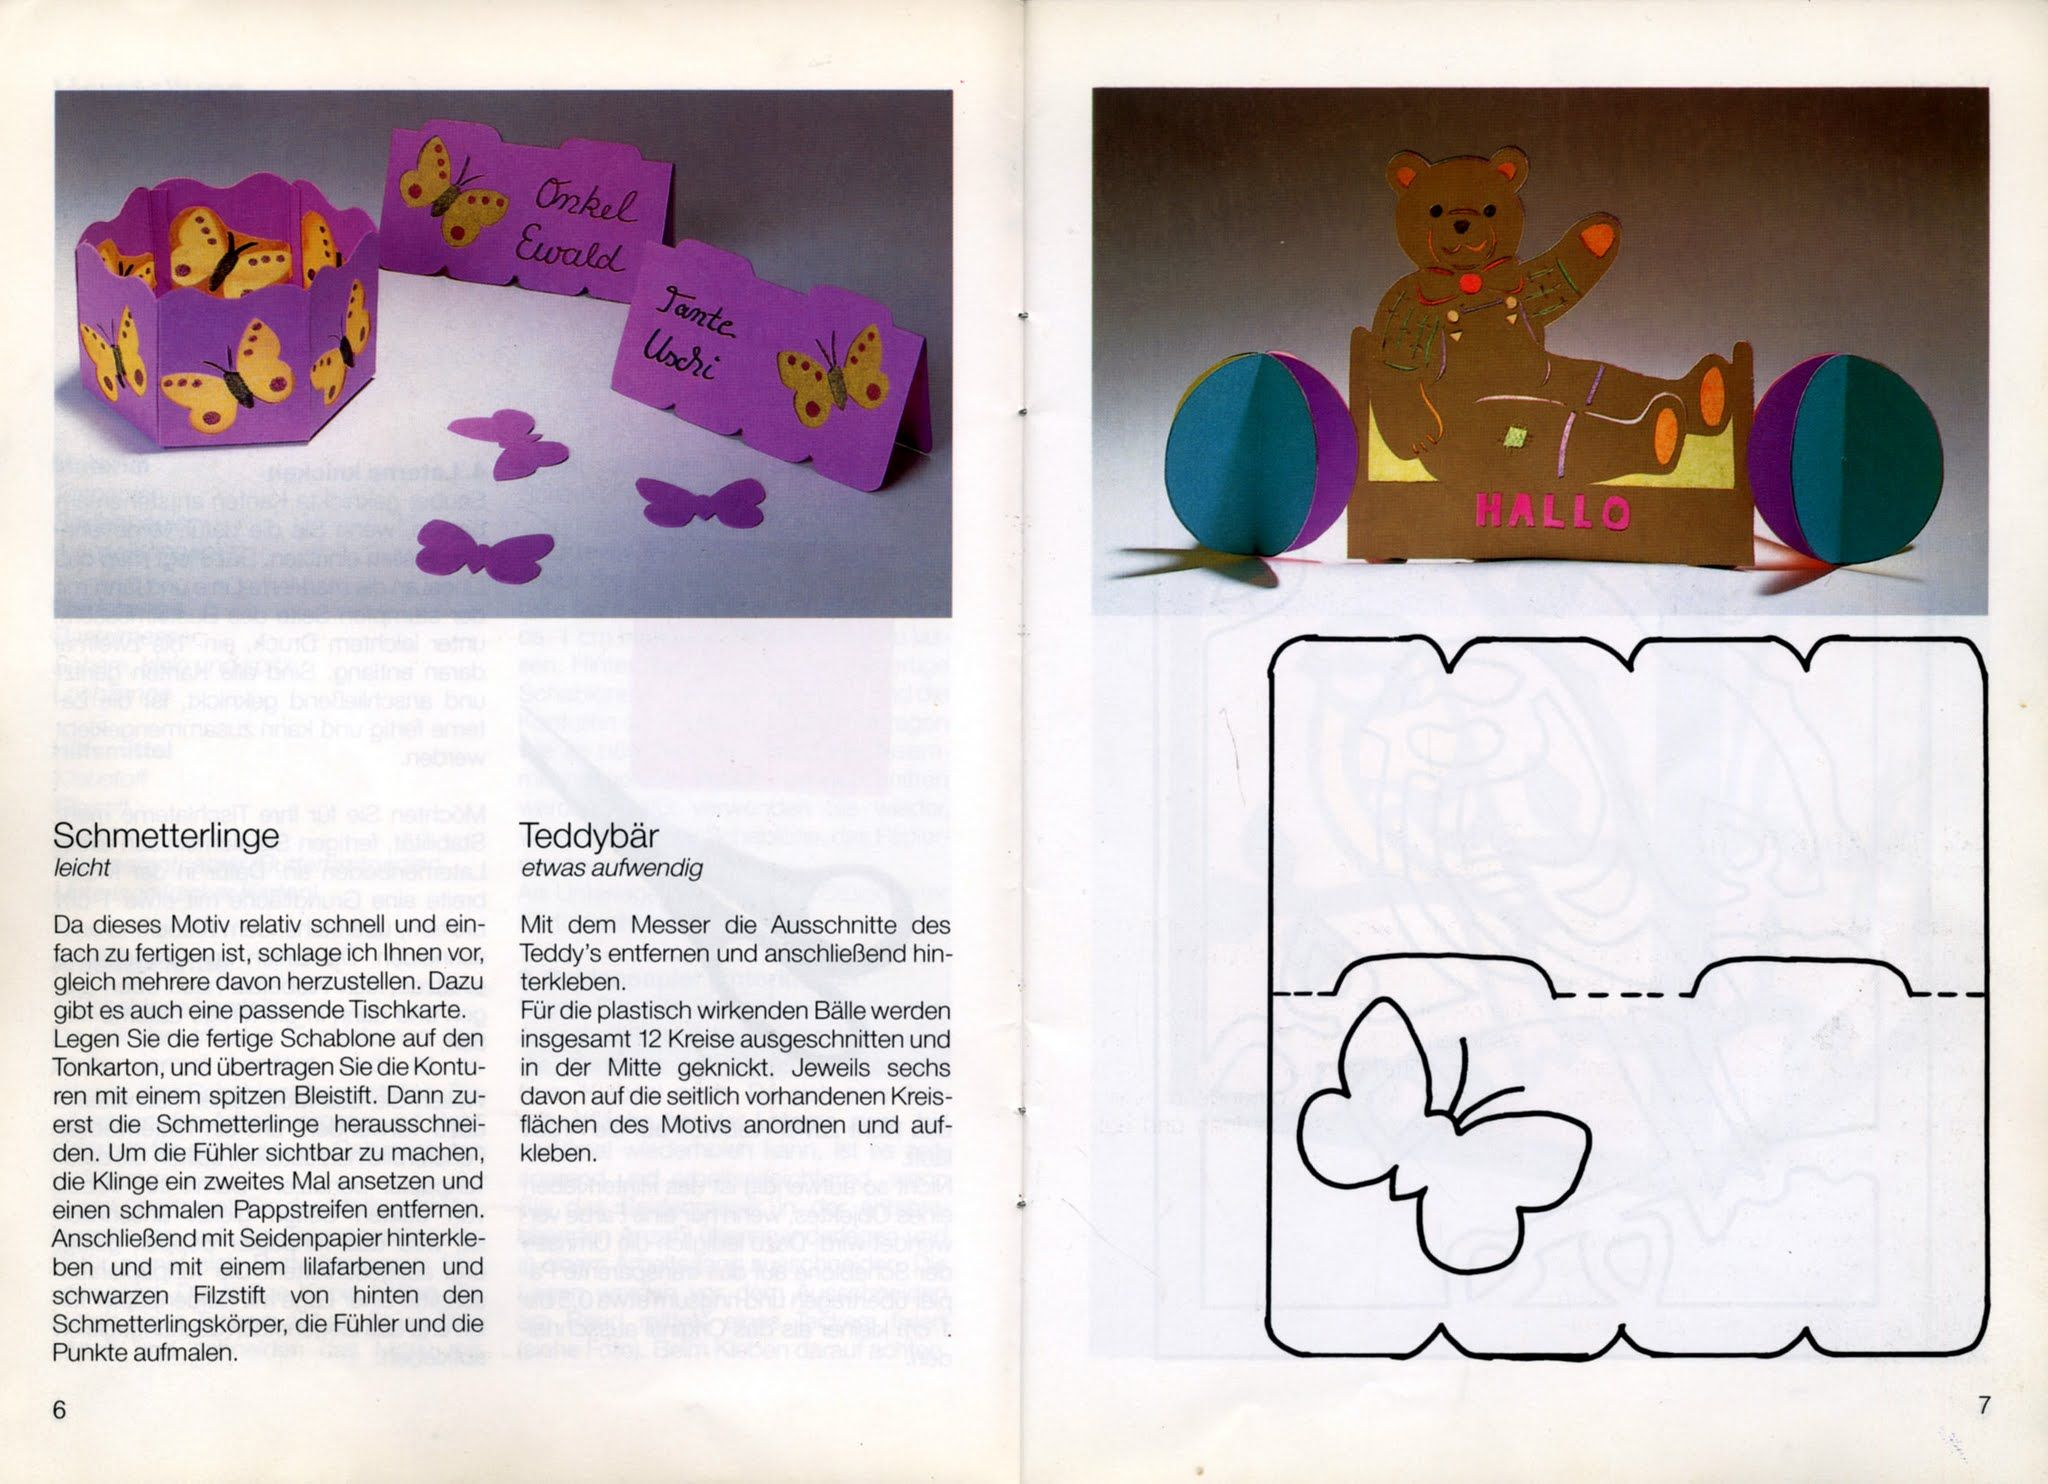 1428 luz - ManualidadeS Alemanas - Веб-альбомы Picasa